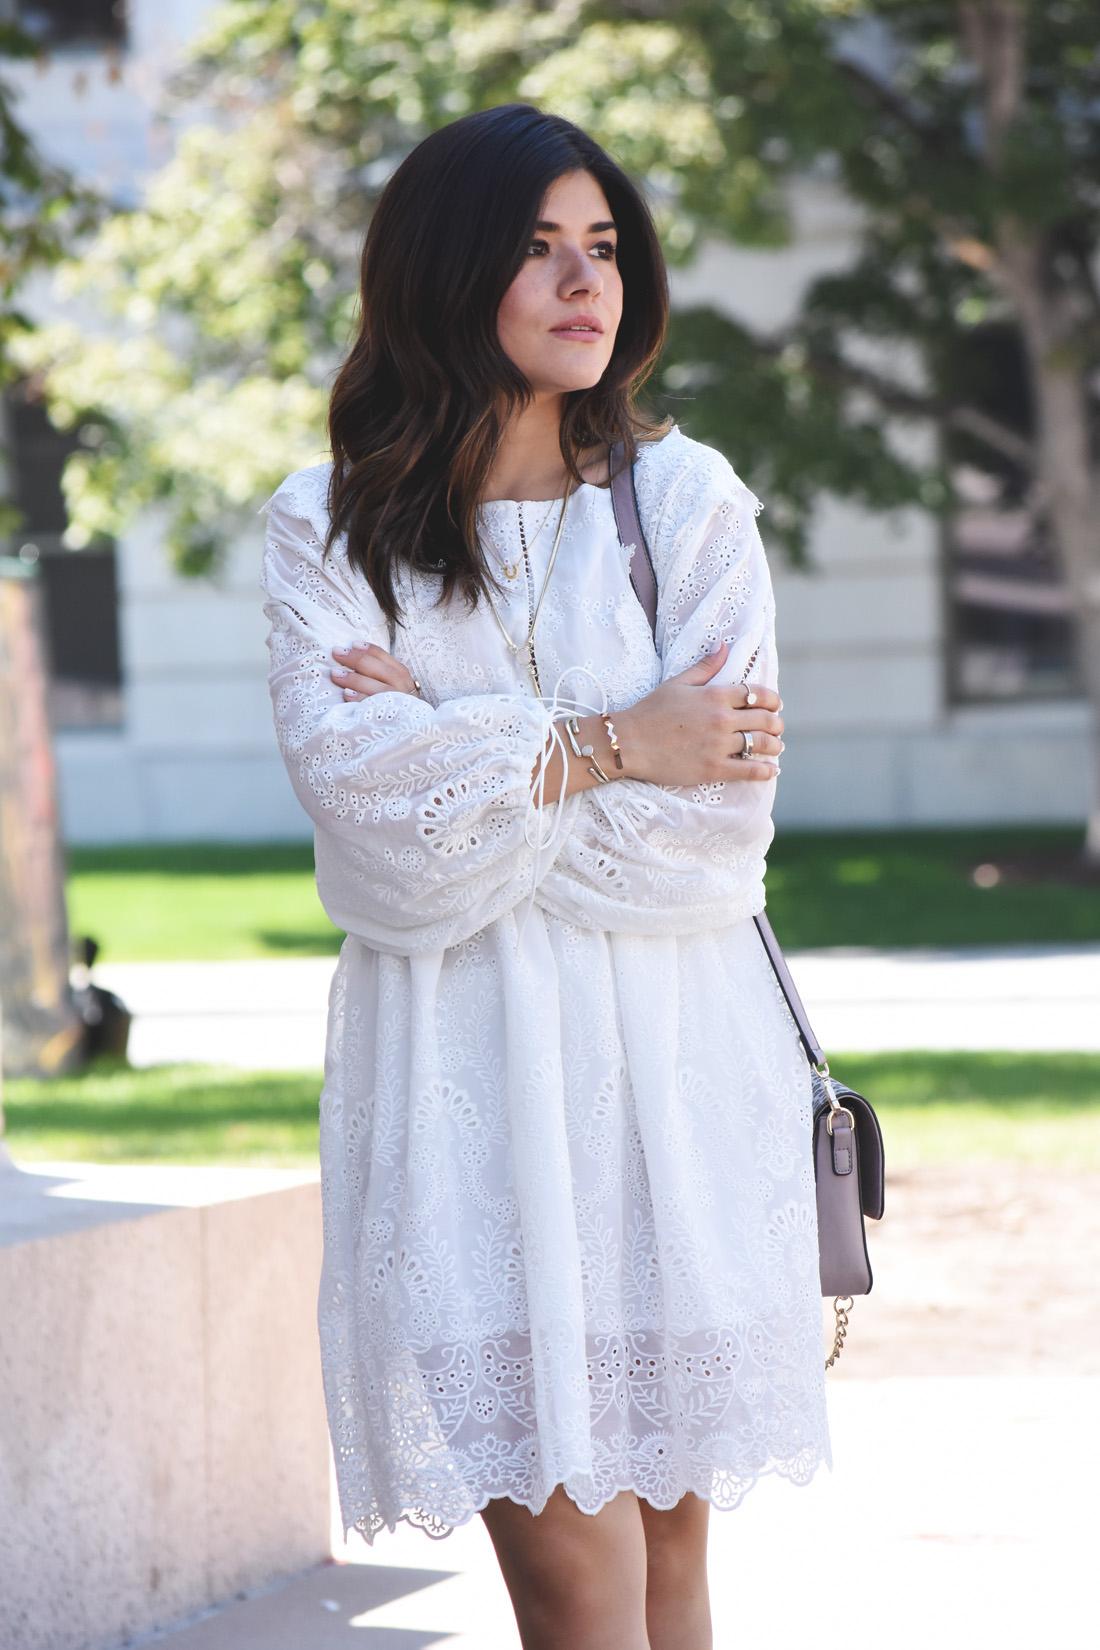 Carolina Hellal of Chic Talk wearing a cutout white summer dress via VIP ME, , Kendra Scott gold bracelets, and necklace.